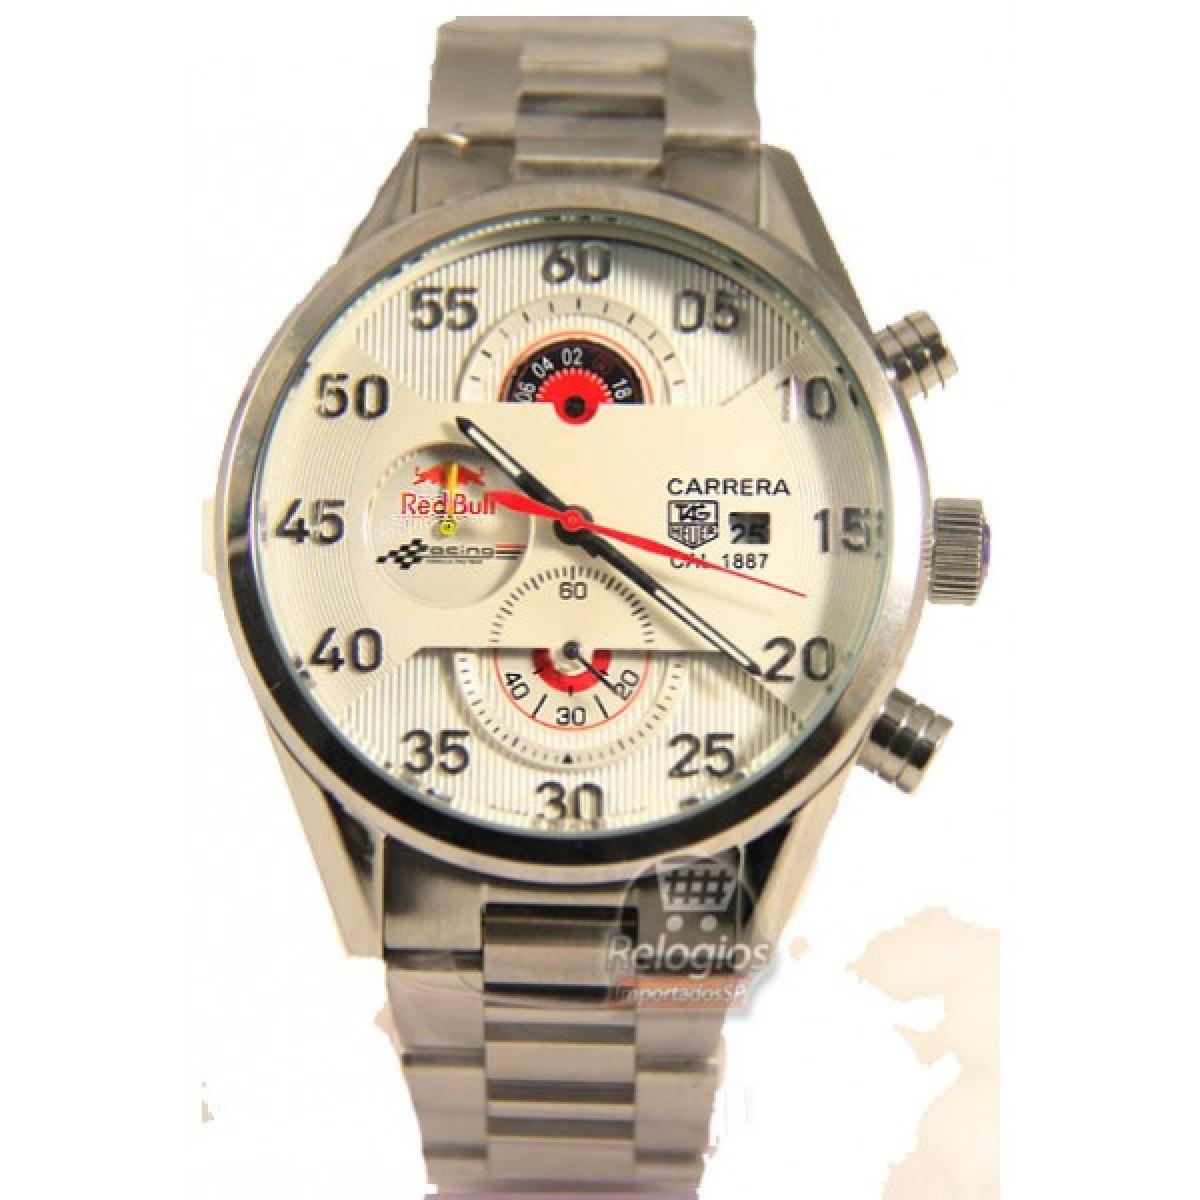 37252713a7a Espiar · Relógio Réplica Tag Heuer Red Bull